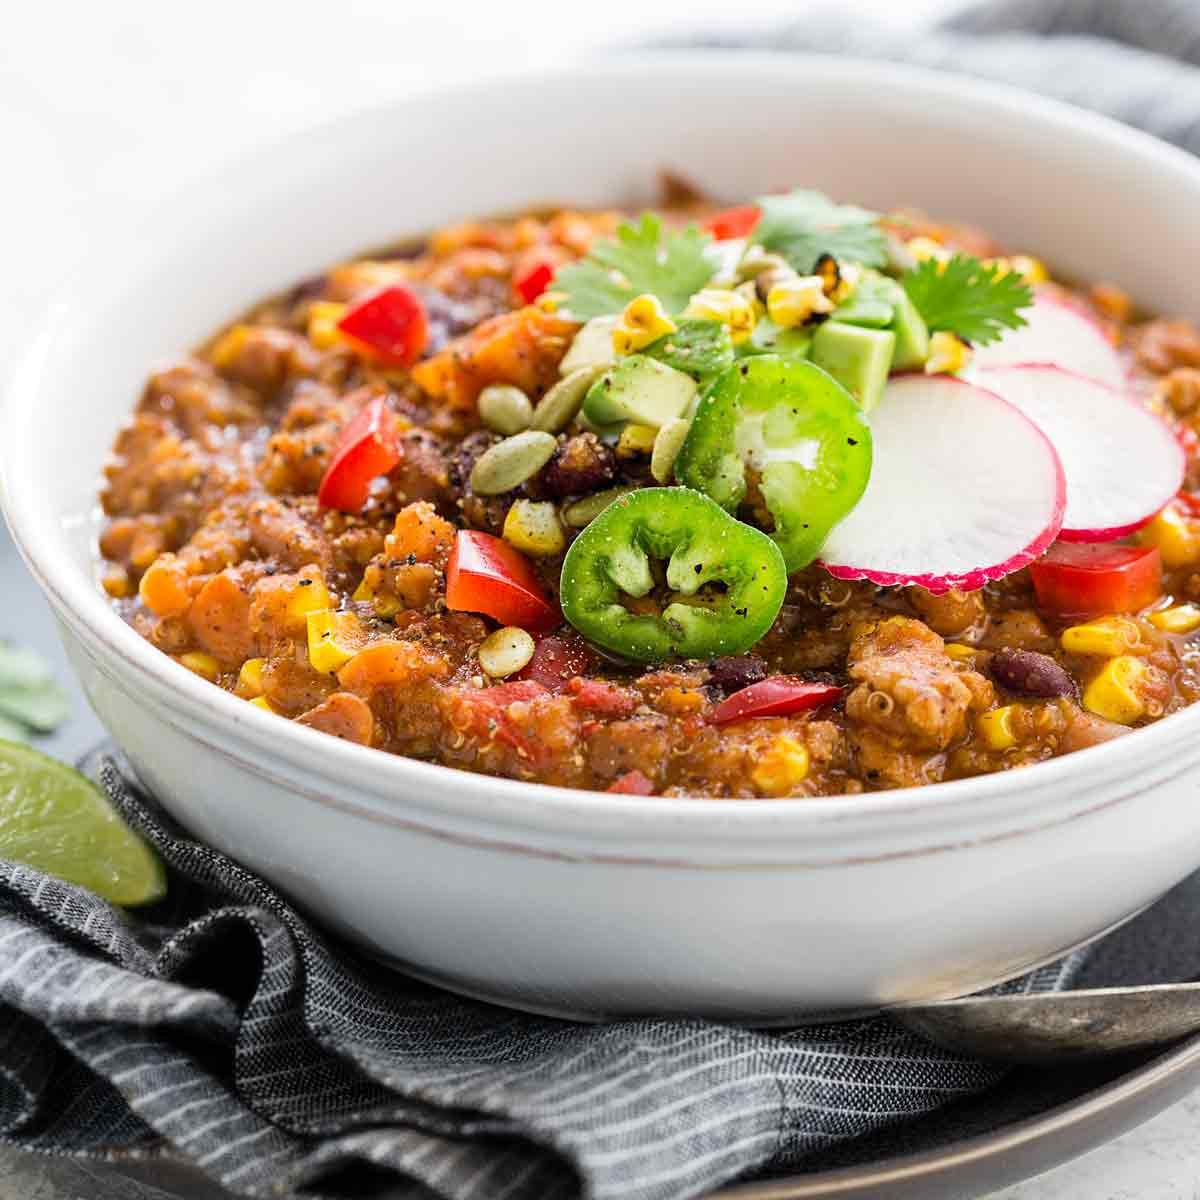 Instant Pot Ground Turkey  Instant Pot Turkey Chili with Quinoa